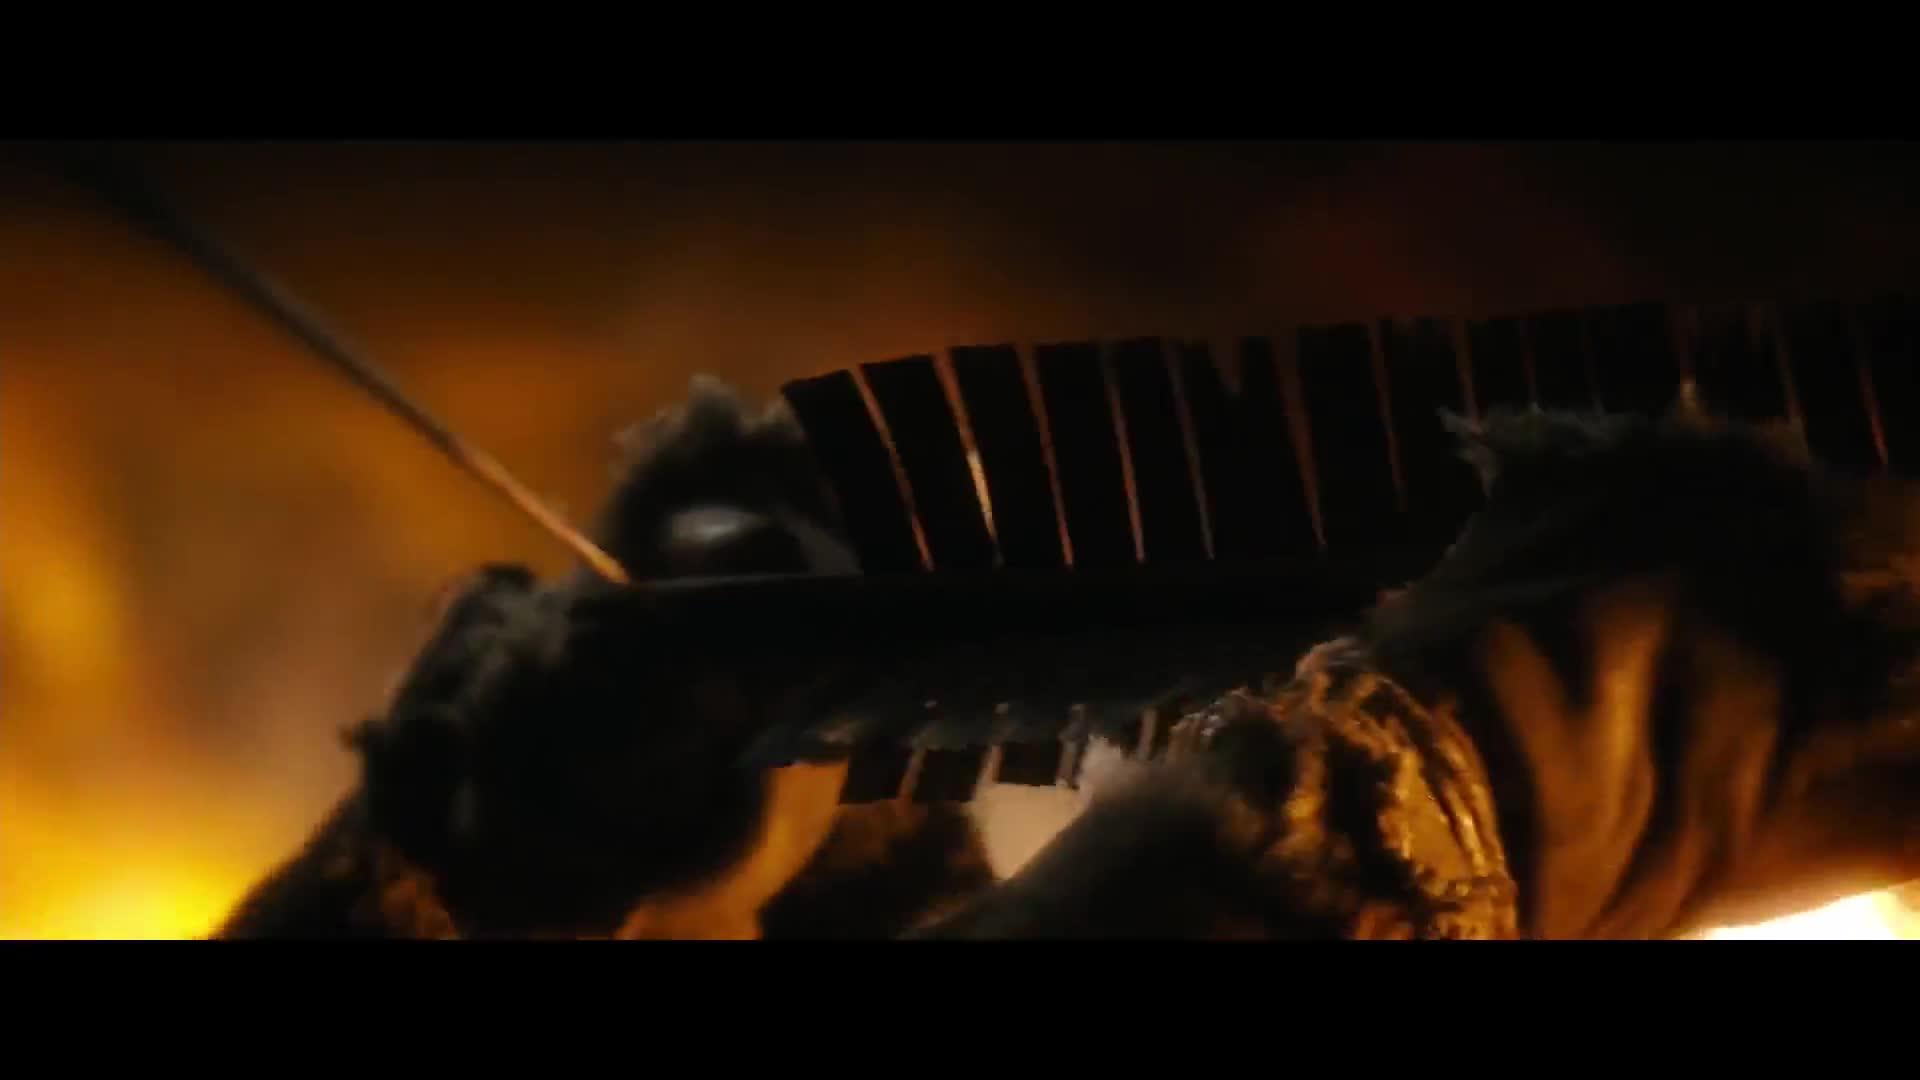 The Hobbit 3 เดอะ ฮอบบิท 3 สงคราม 5 ทัพ (2014)